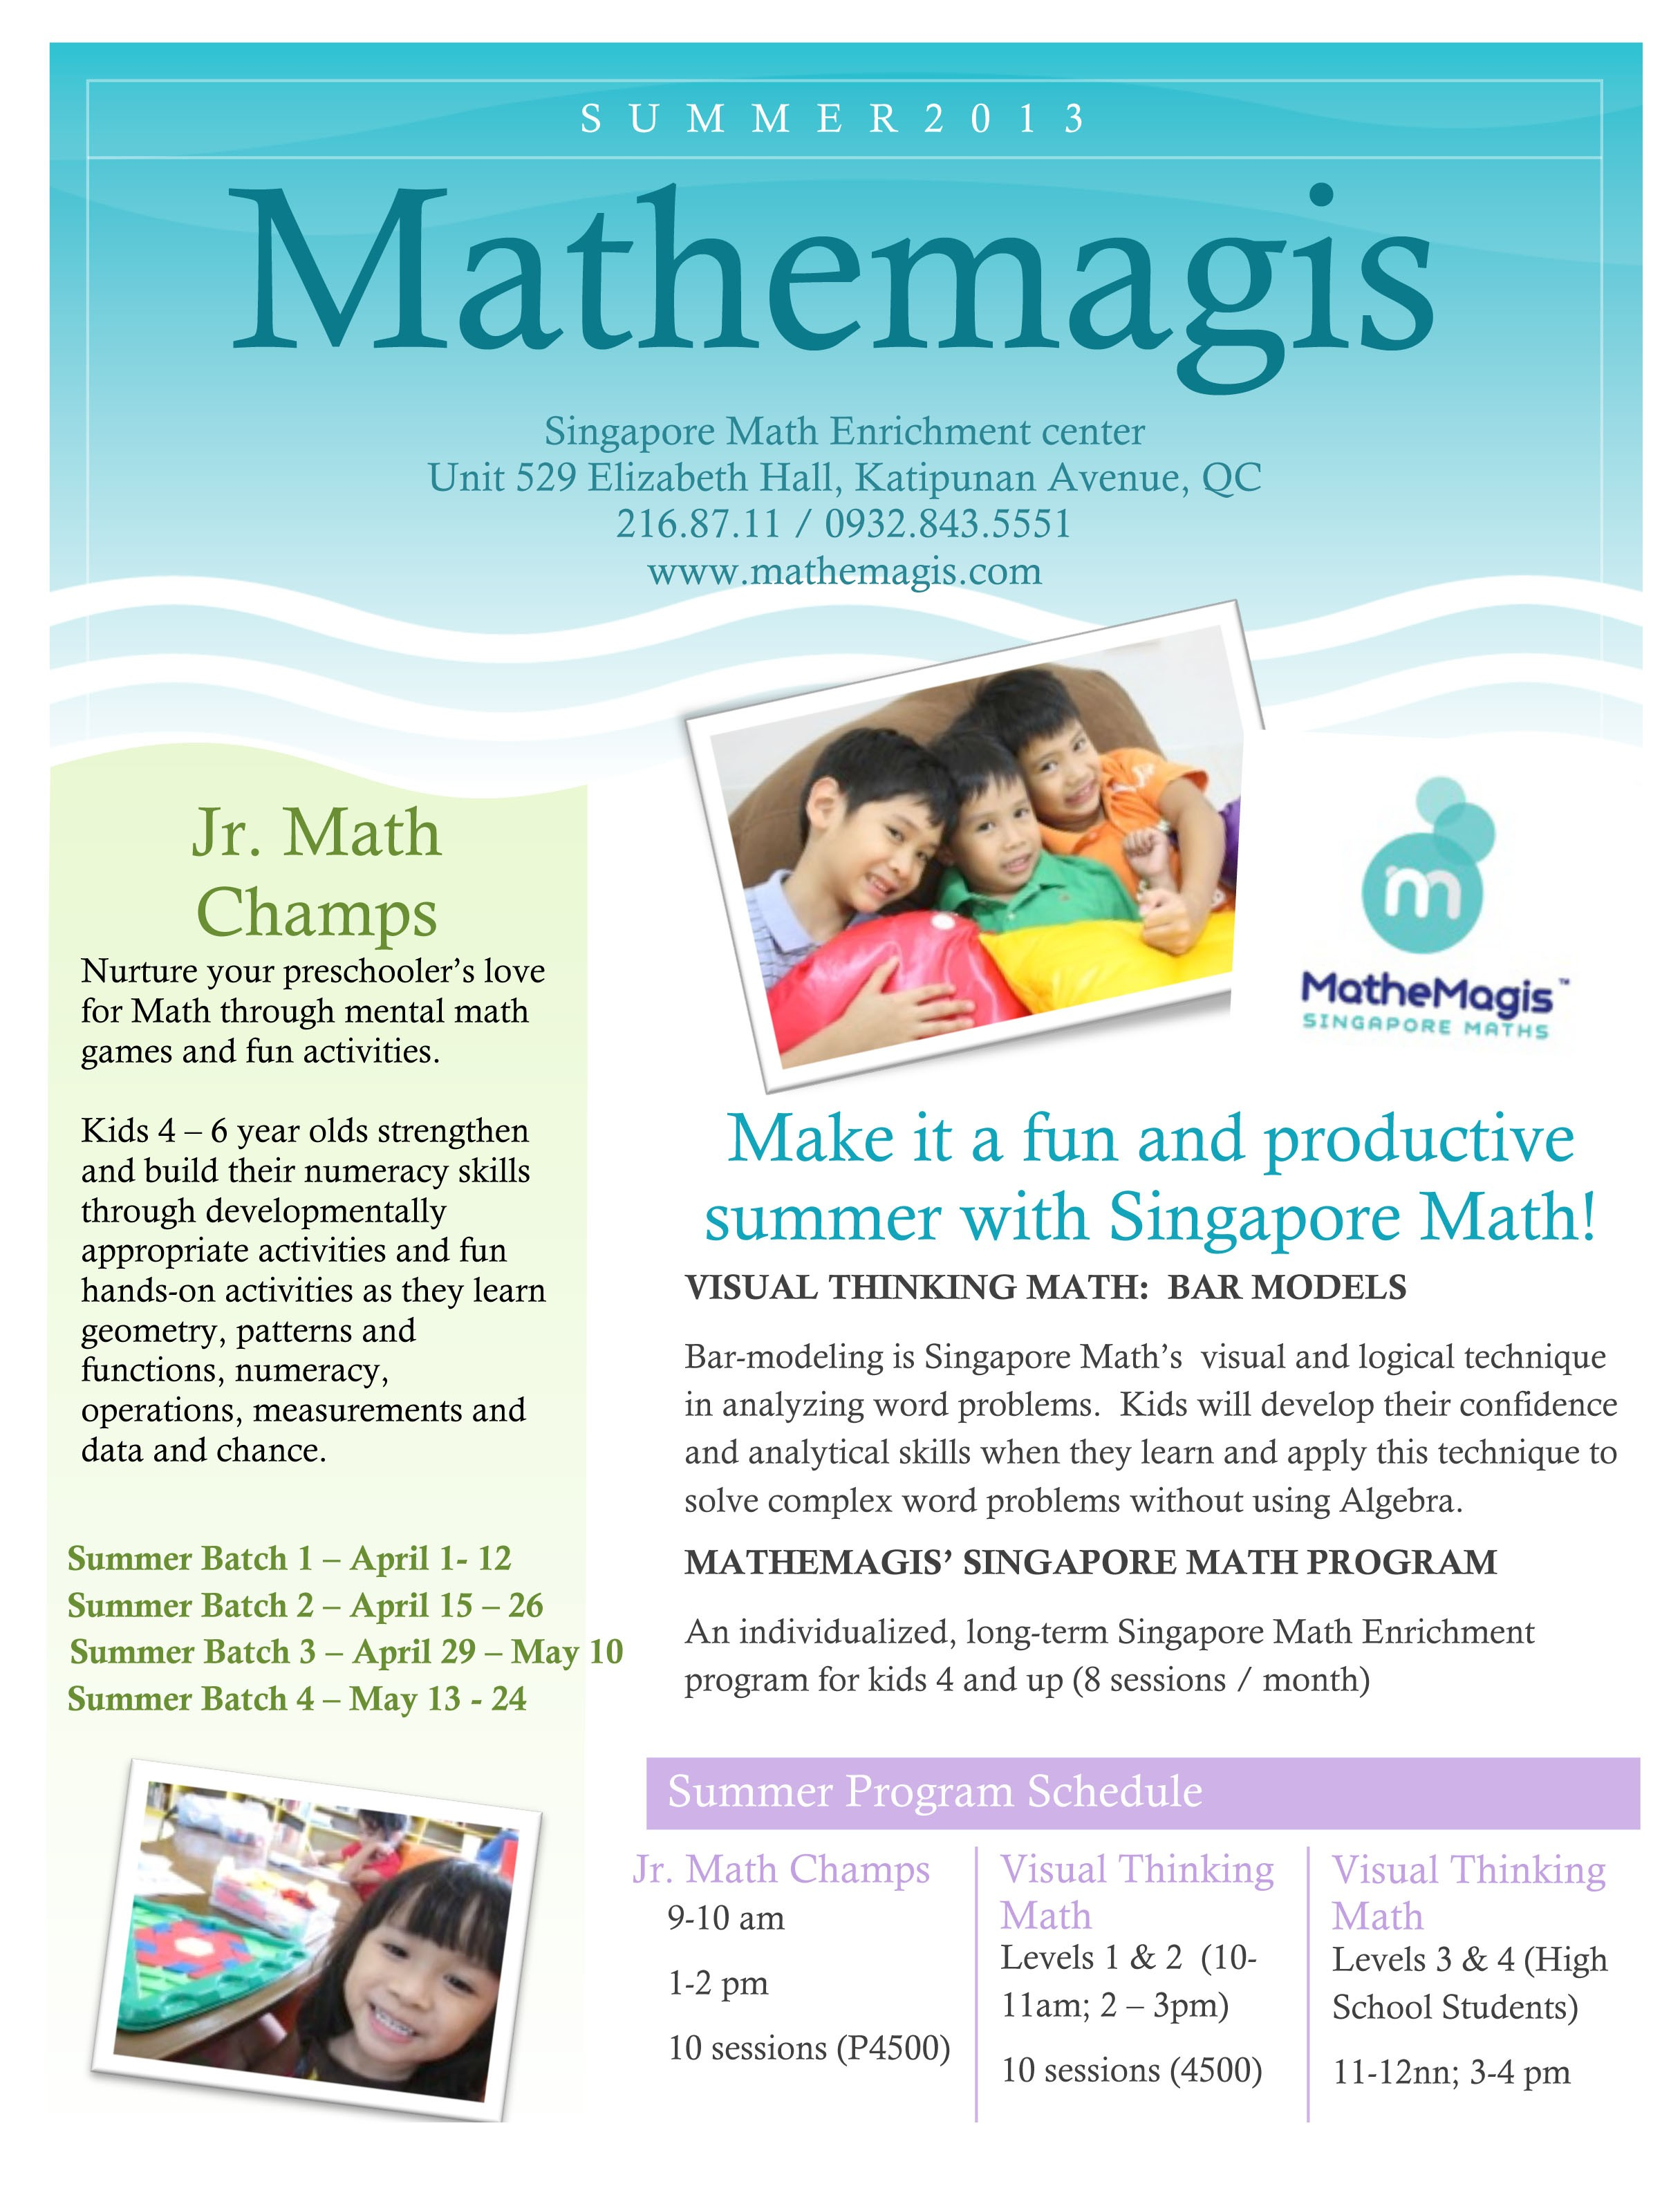 Calendario 2019 Salvador Recientes Mathemagis Singapore Maths Blog Archive Make It A Fun and